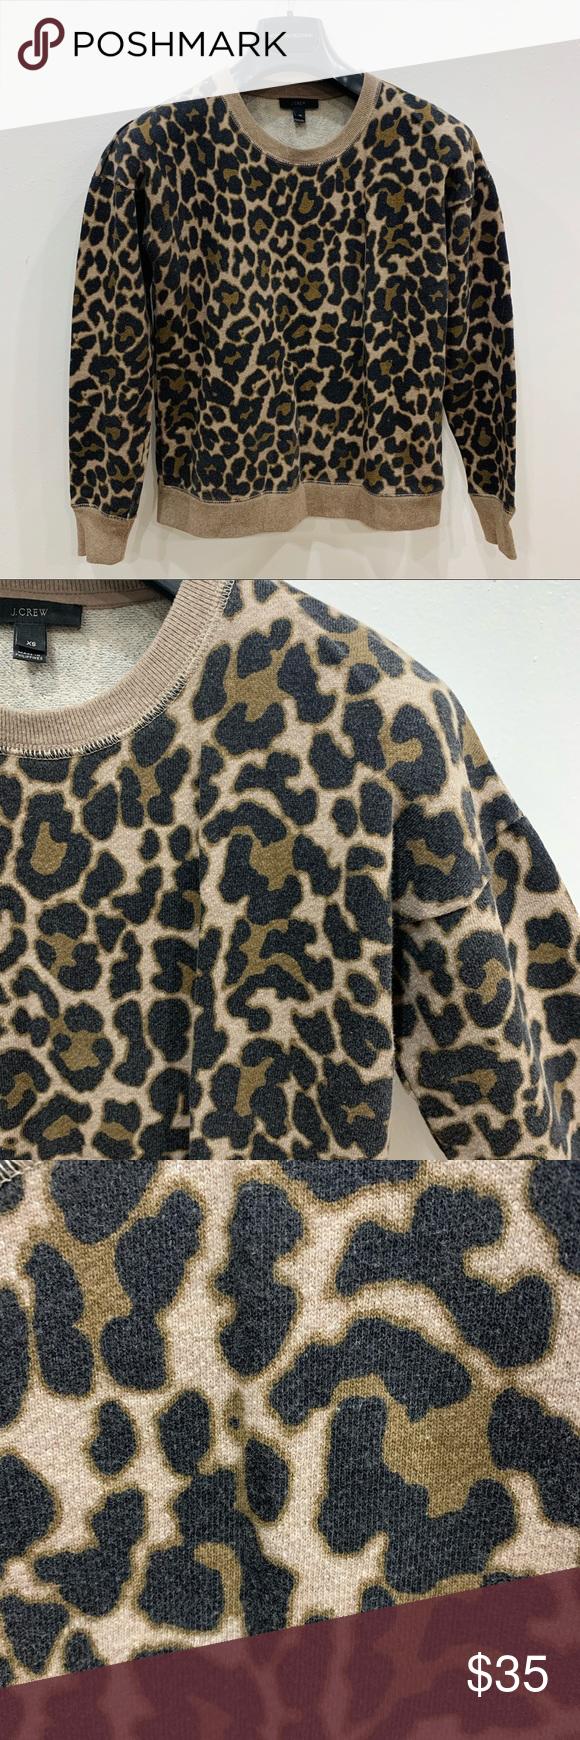 J Crew Crewneck Sweatshirt In Leopard Print Xs As Seen On Photos Good Condition Cotton Blend Chic Cas Clothes Design Crew Neck Sweatshirt Casual Sweatshirt [ 1740 x 580 Pixel ]